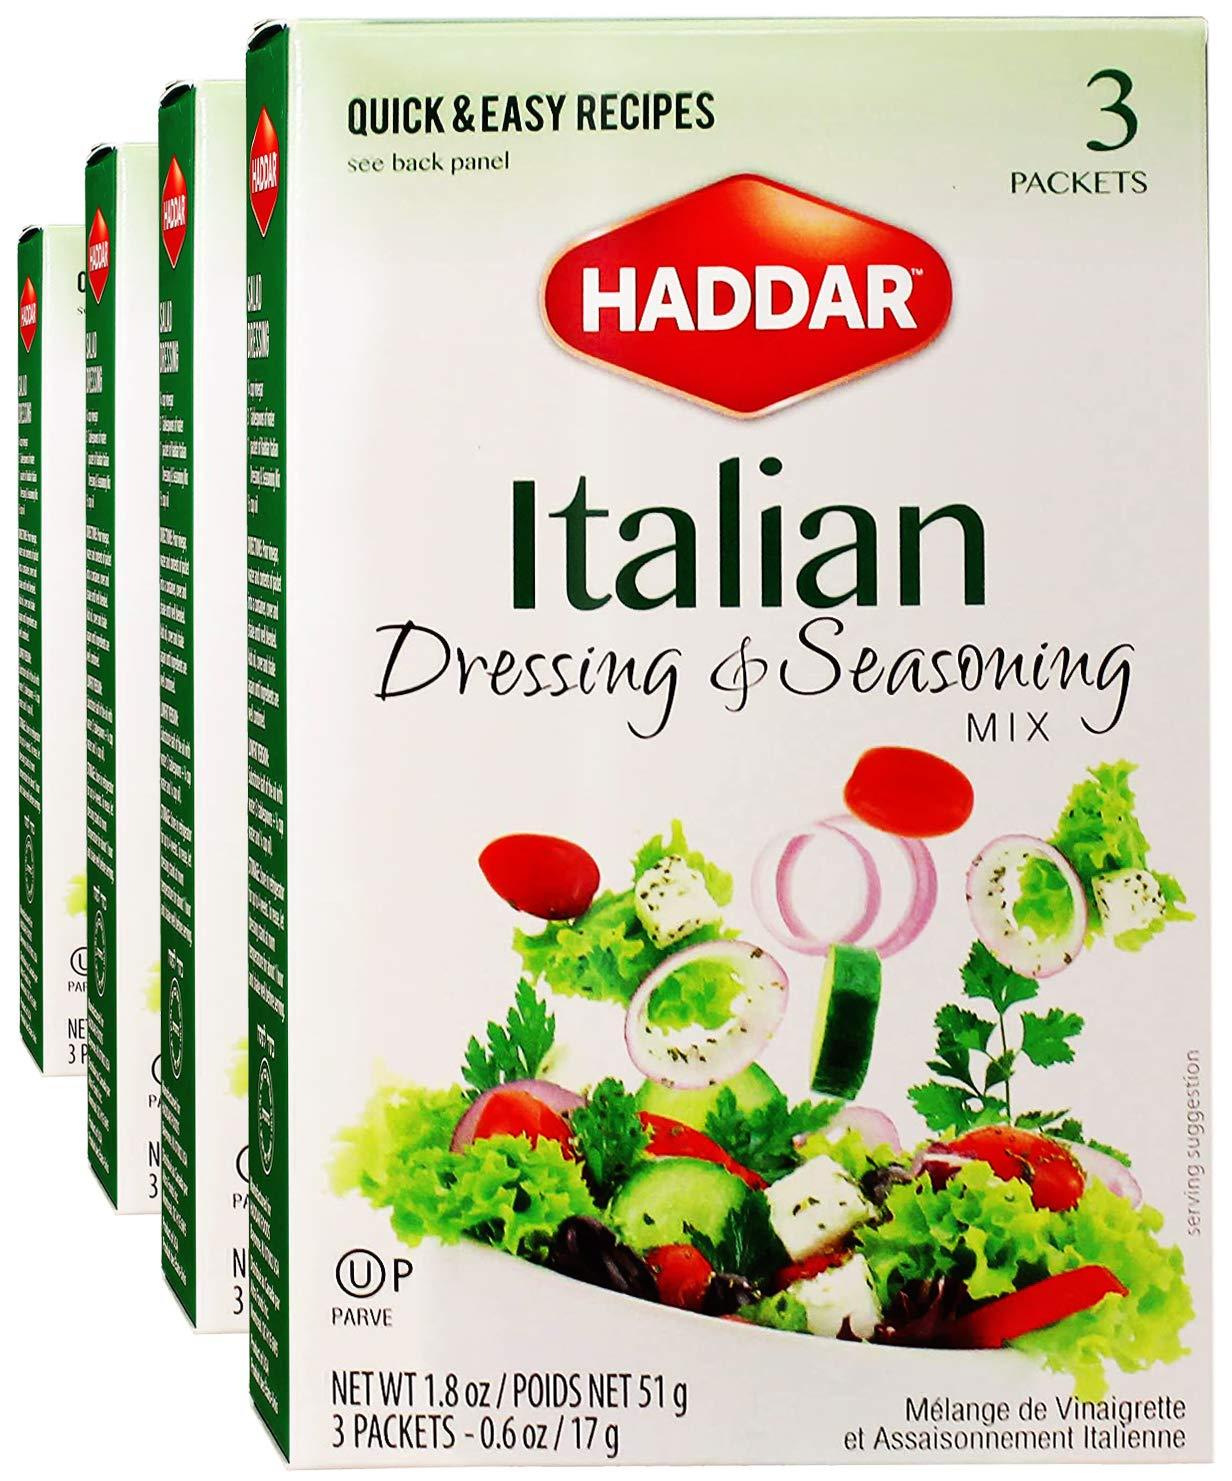 Haddar Gluten Free Italian Dressing Mix